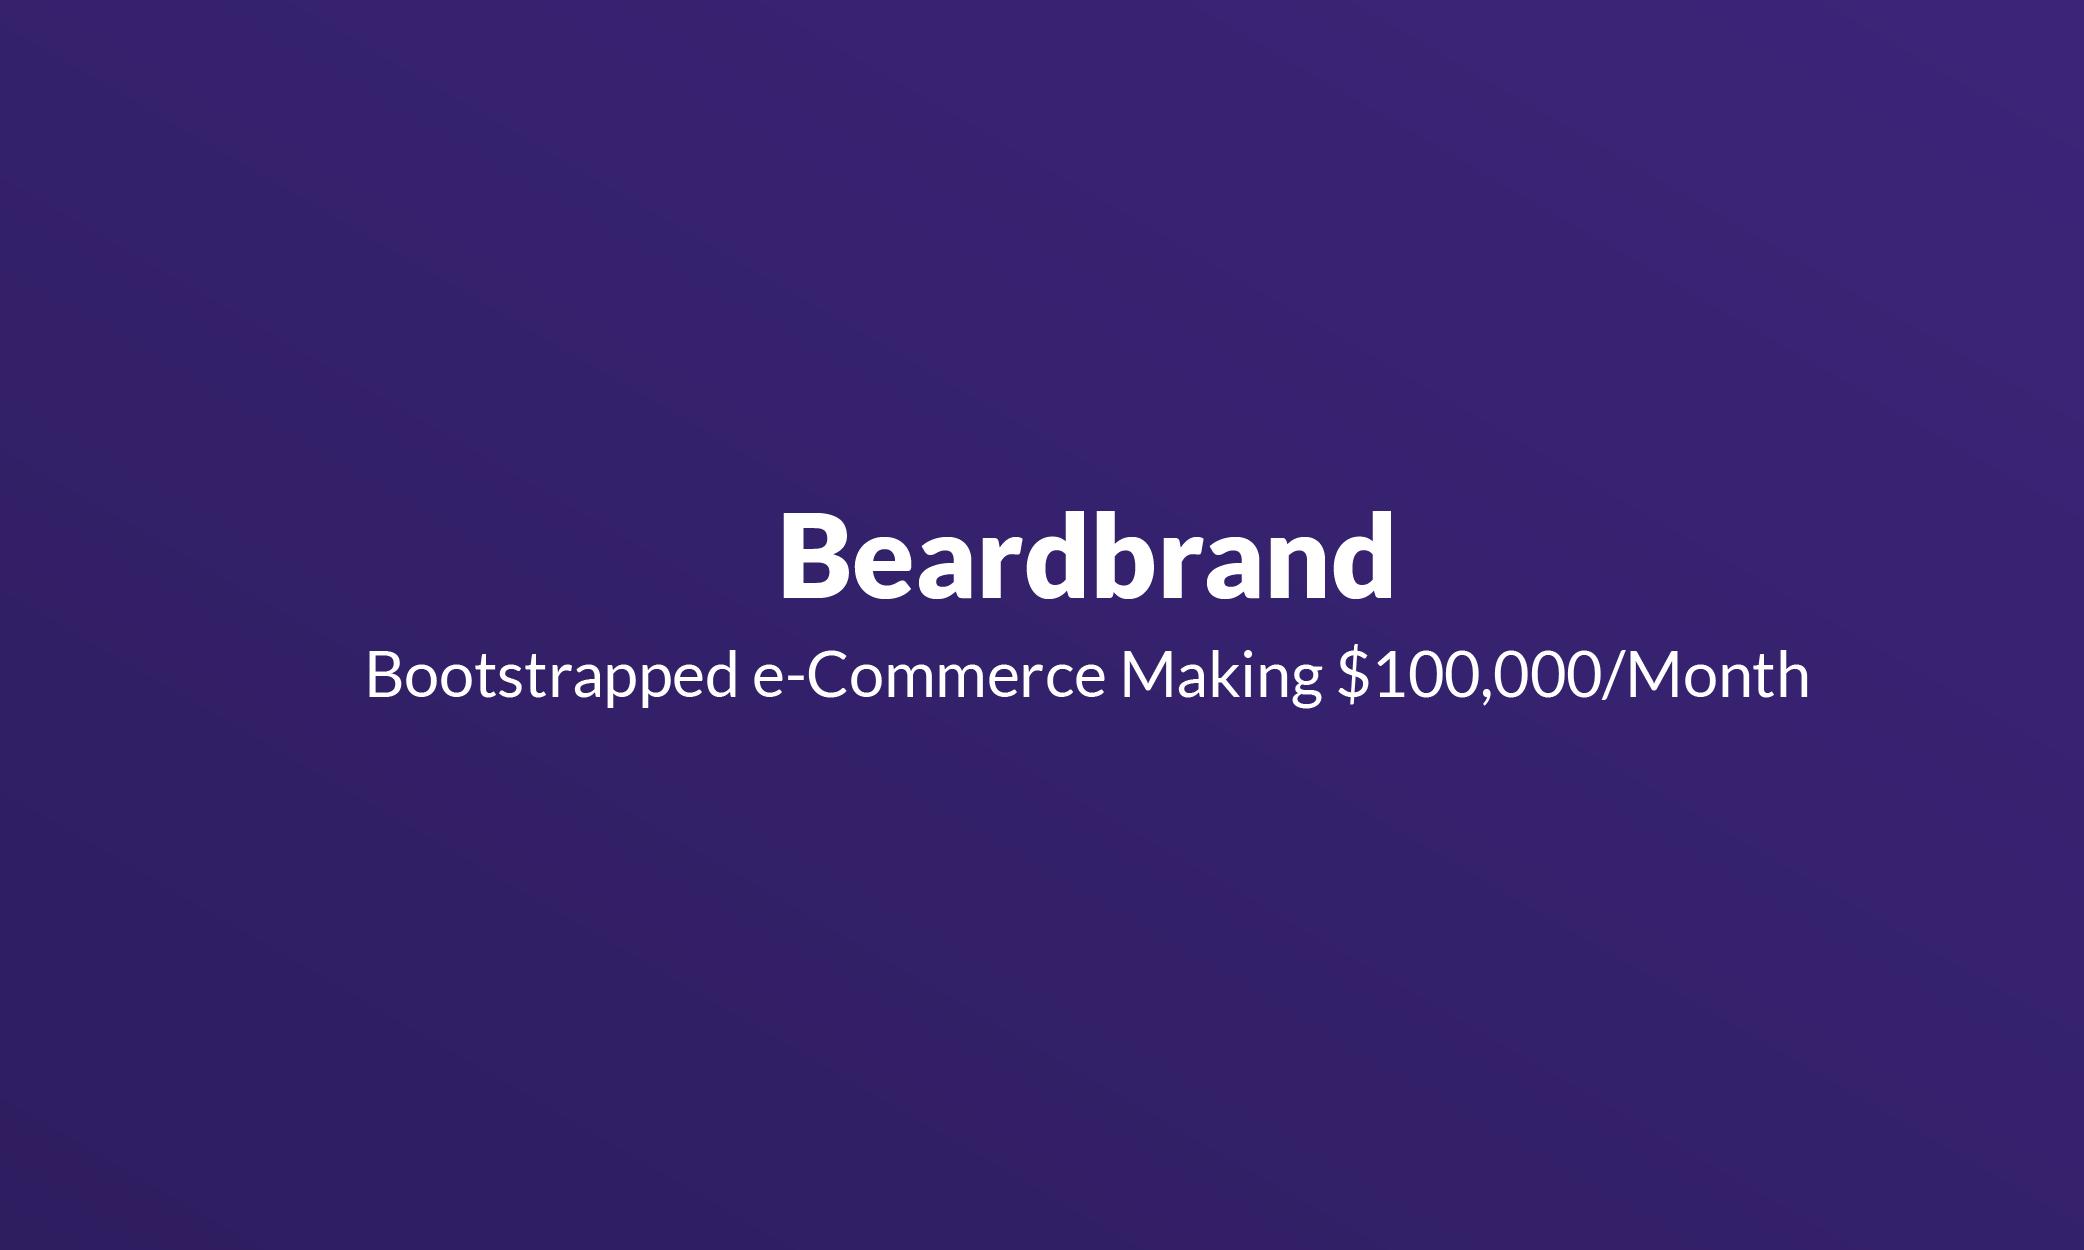 Beardbrand Mistakes